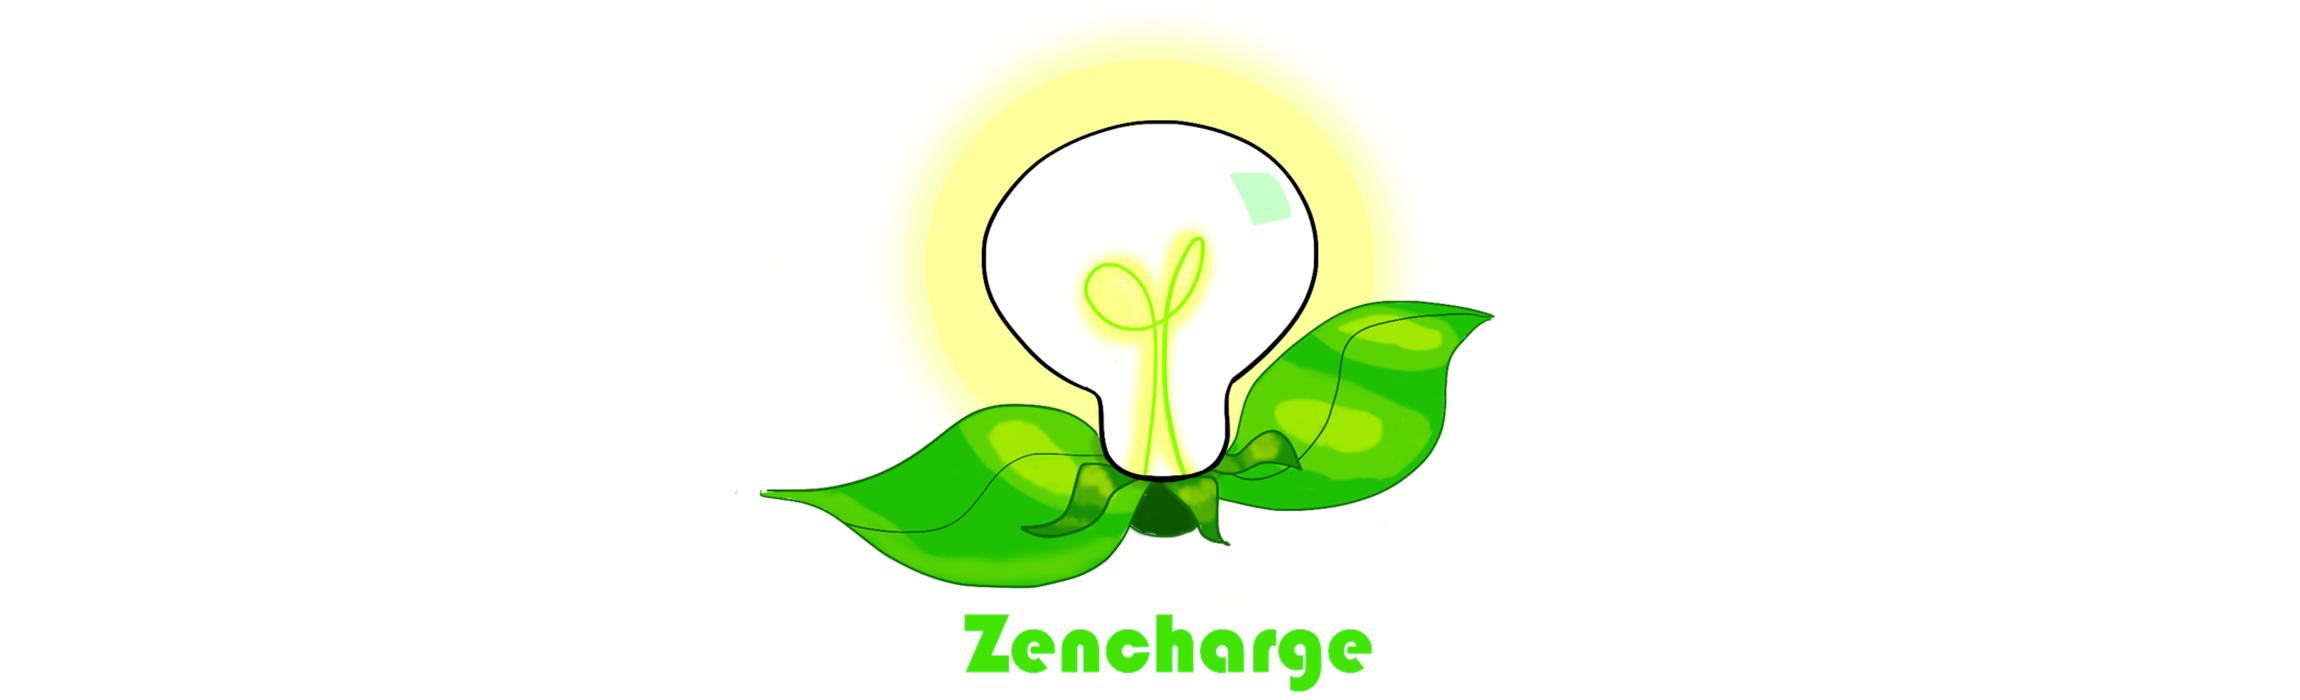 zencharge_resizedlogo.png